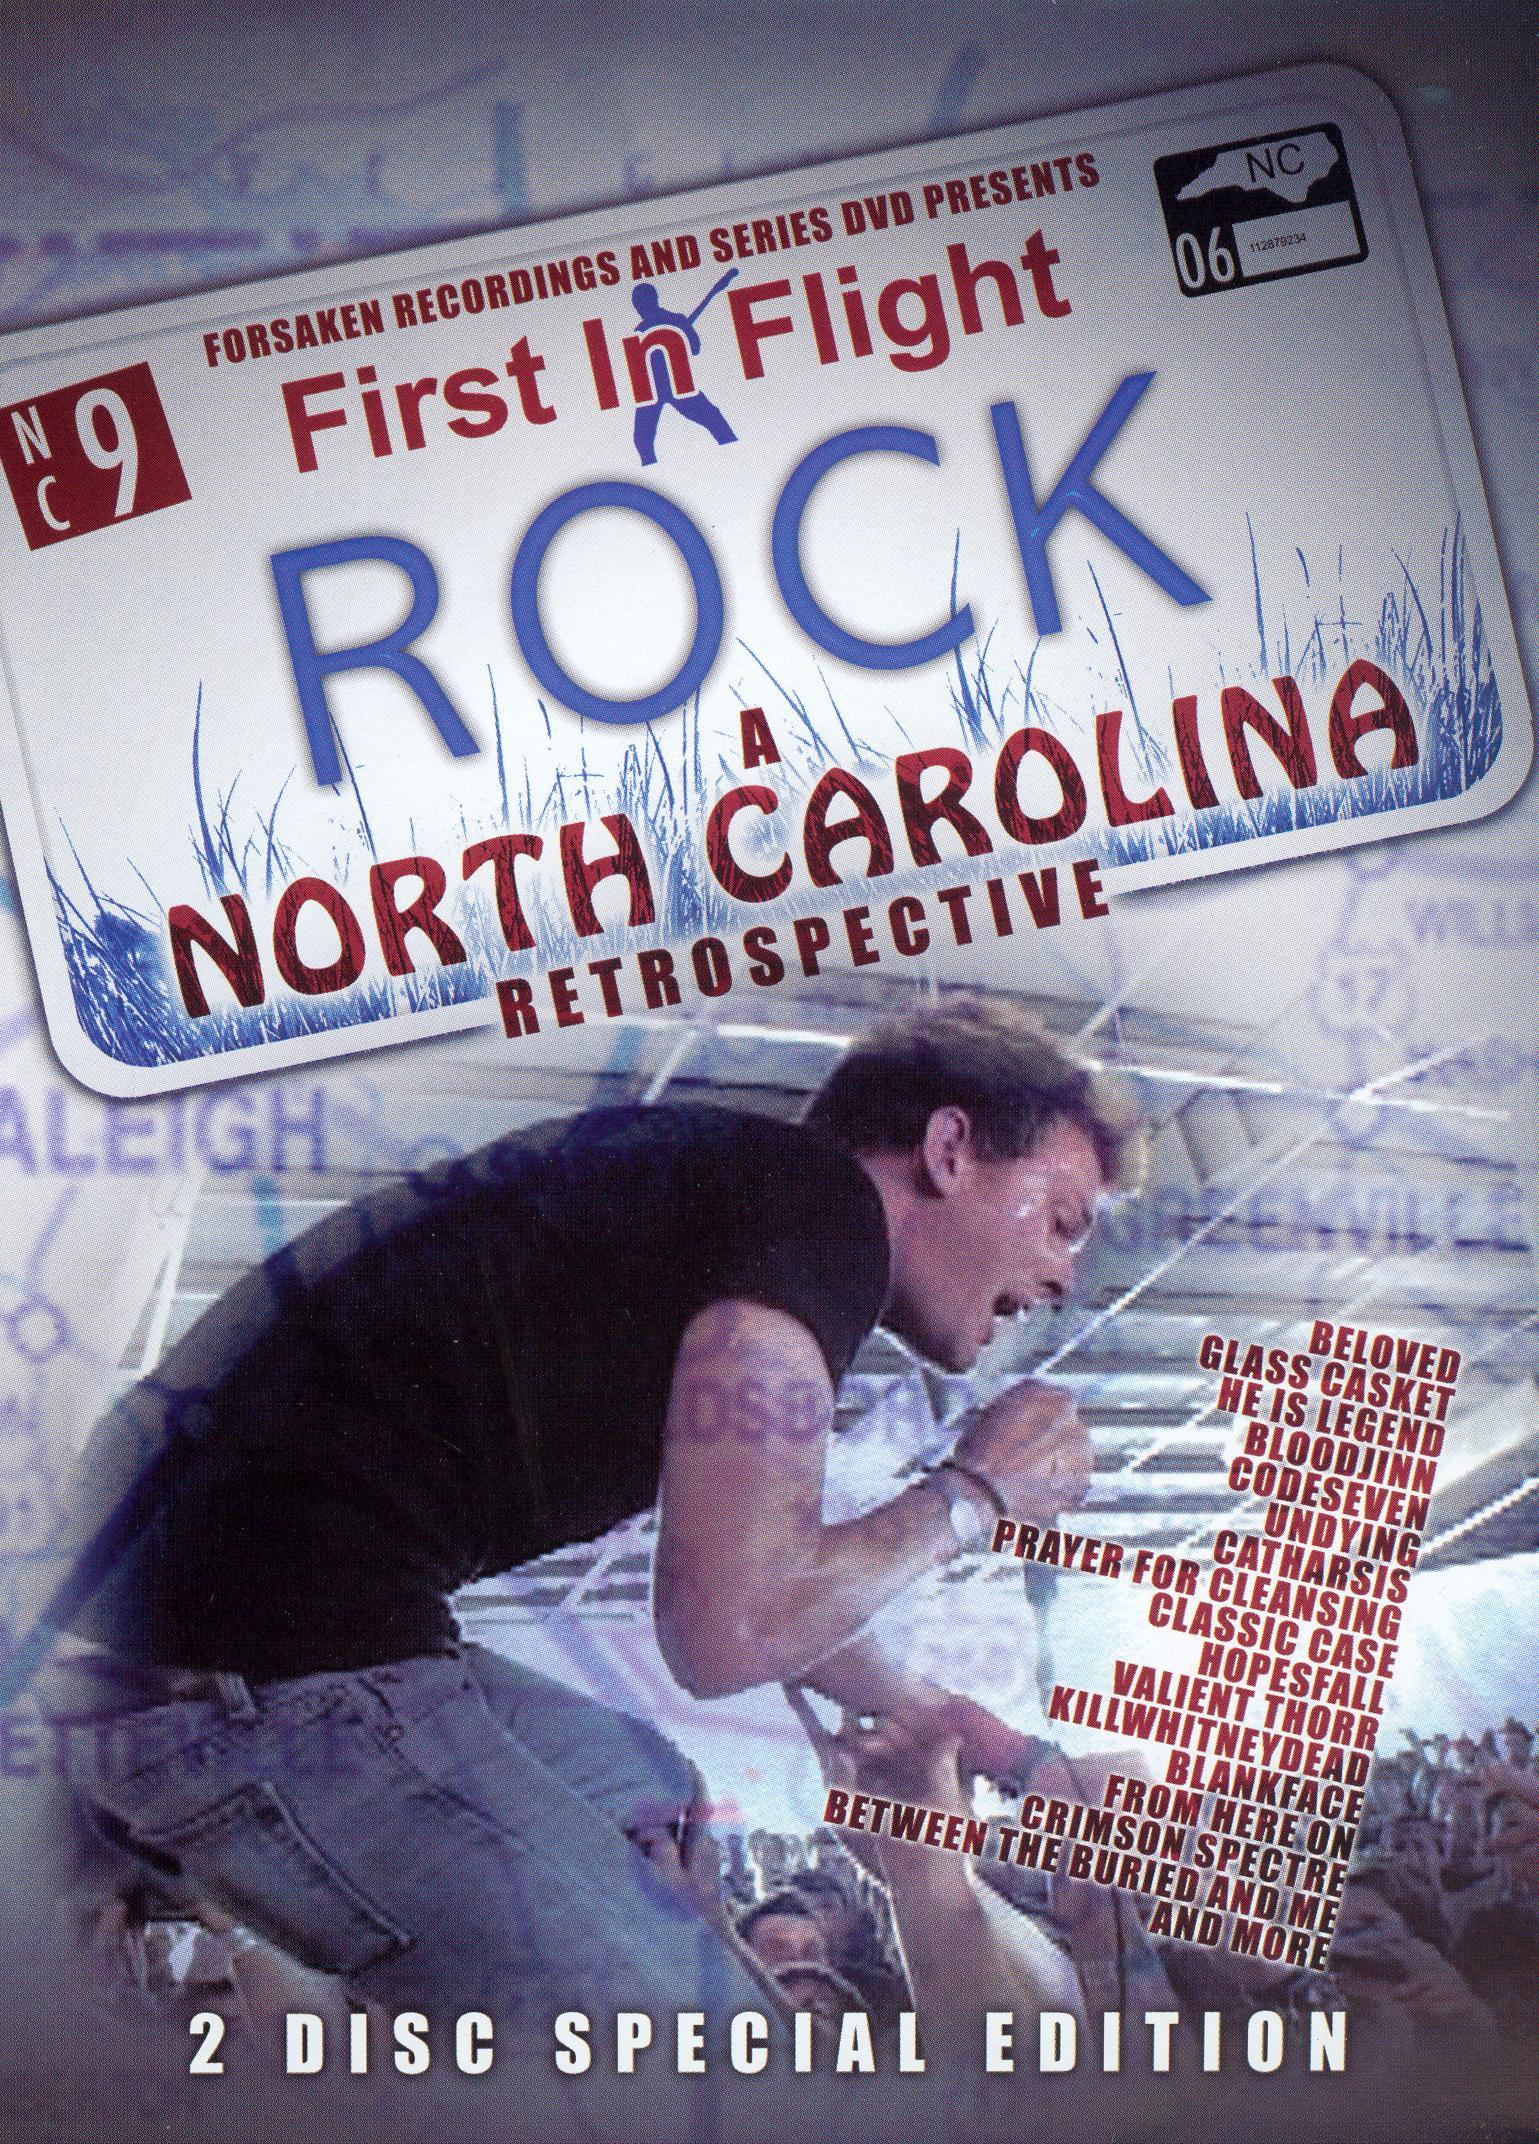 First in Flight: A North Carolina Retrospective